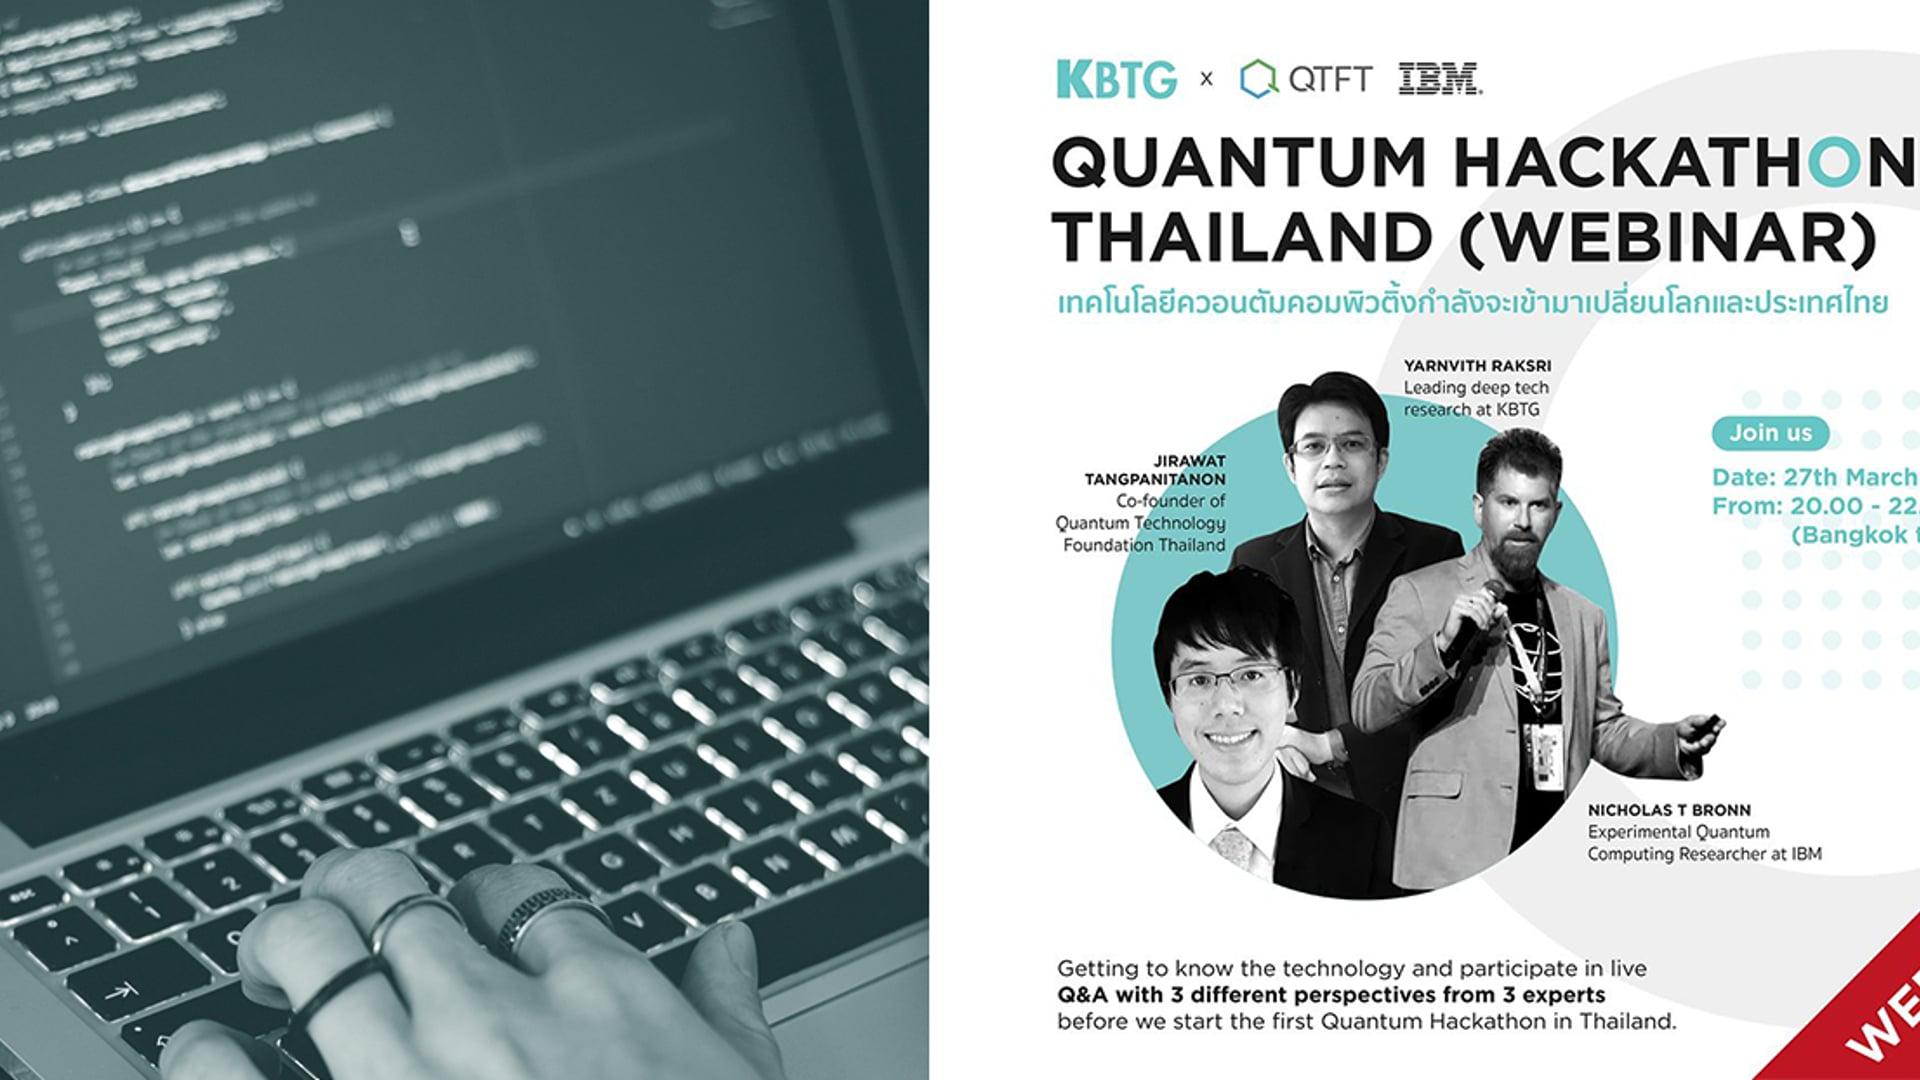 A Guide to Quantum Hackathon Thailand